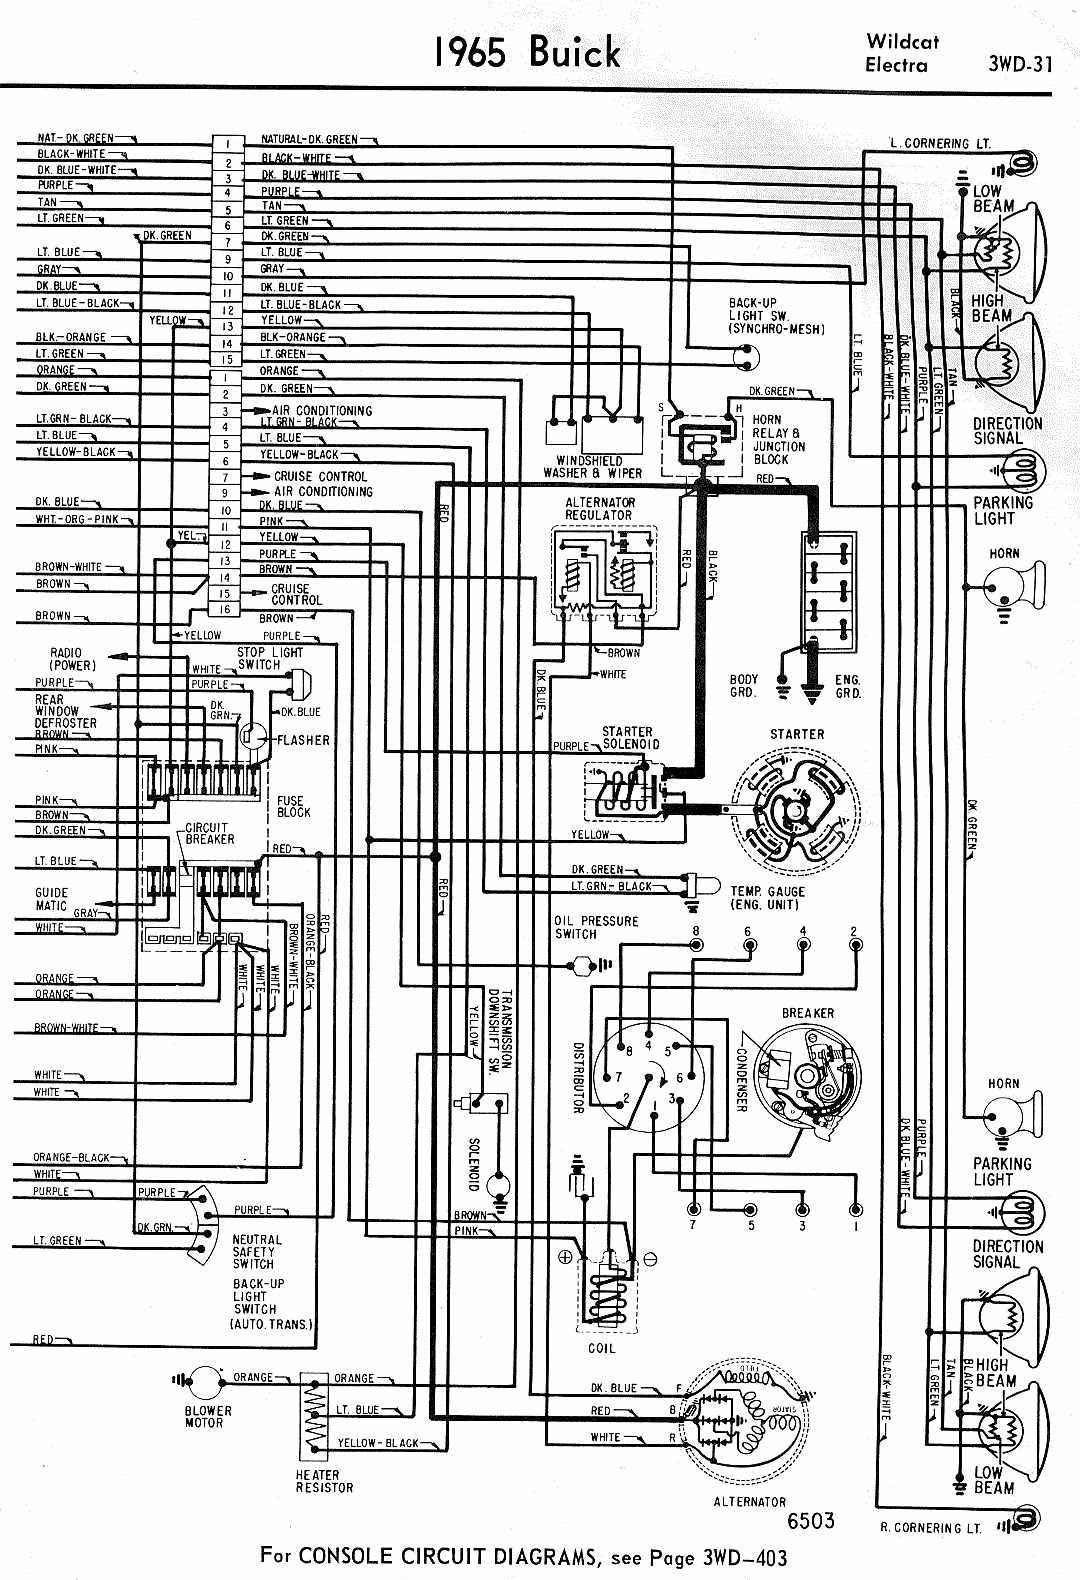 wiring diagram likewise wiring diagram in addition cadillac deville rh abetter pw